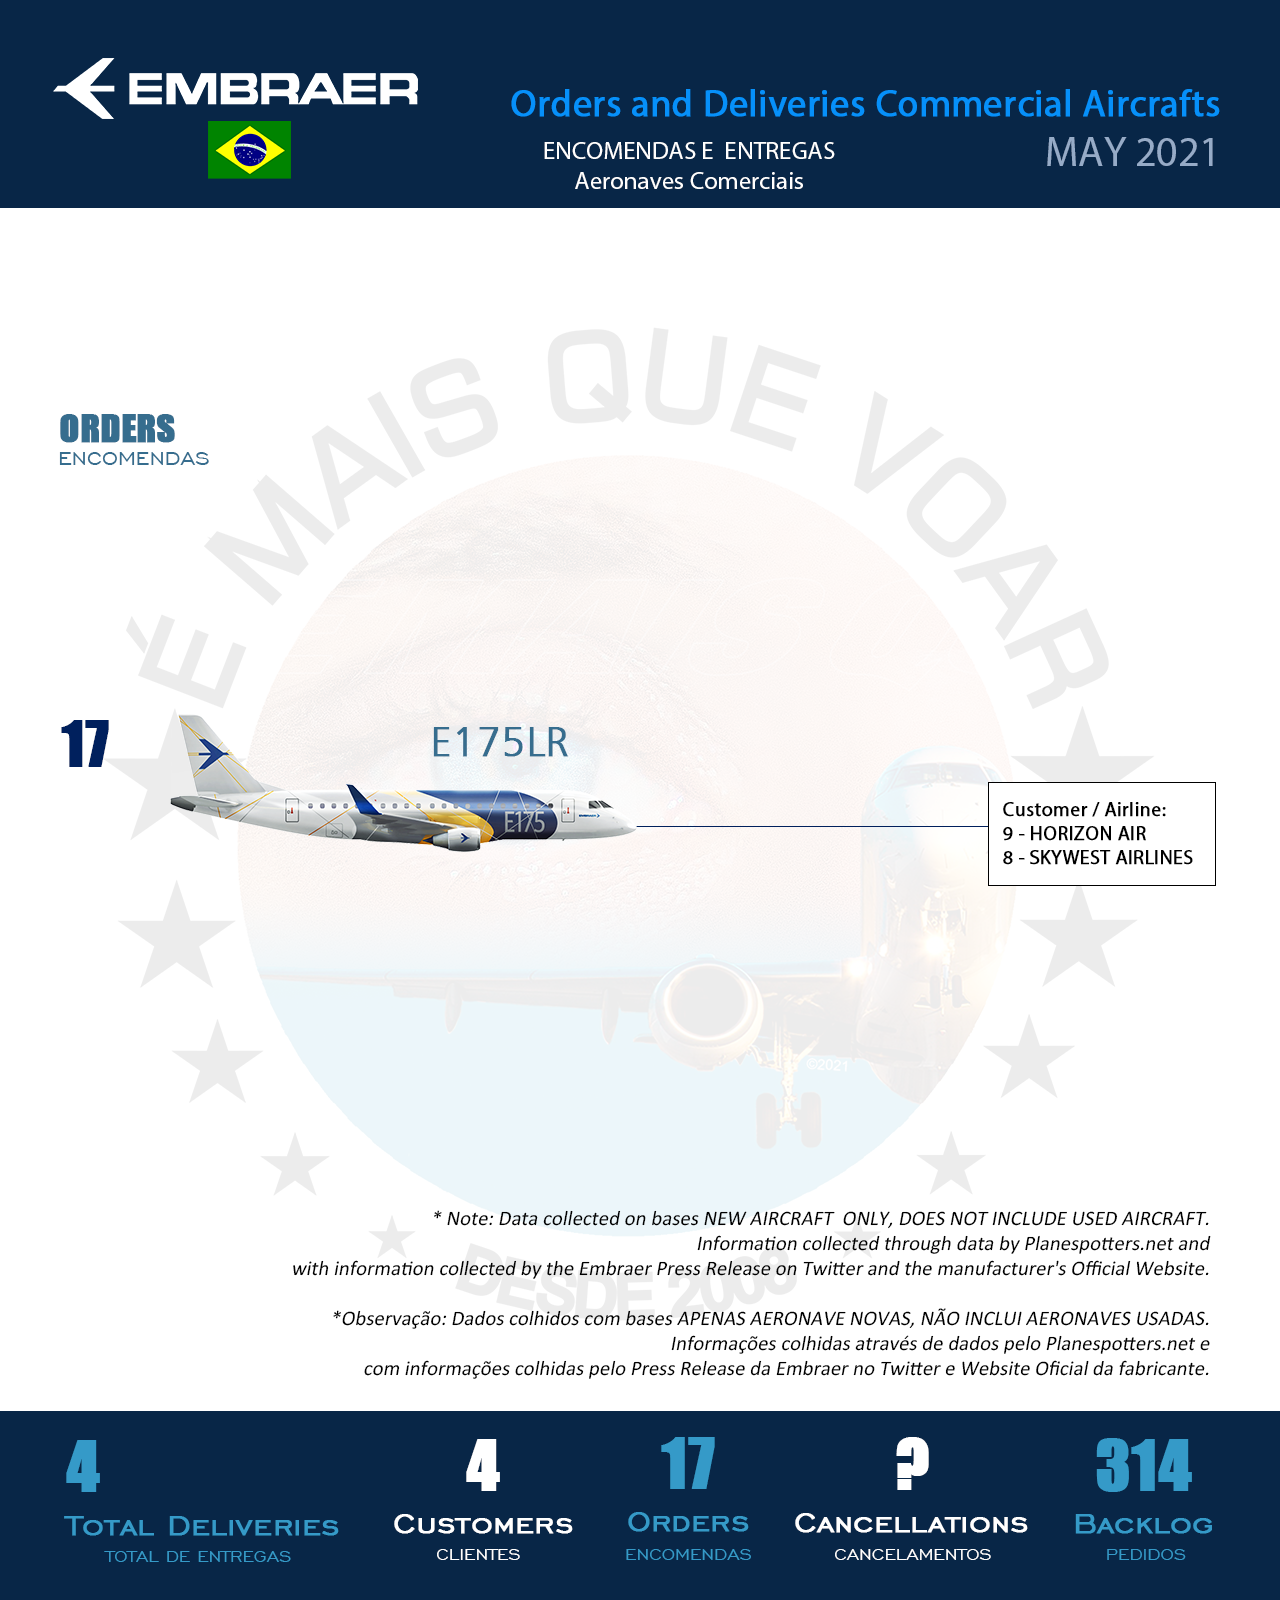 Infográfico: Encomendas e Entregas Aeronaves Comerciais da Embraer (EMBR3) – Maio 2021